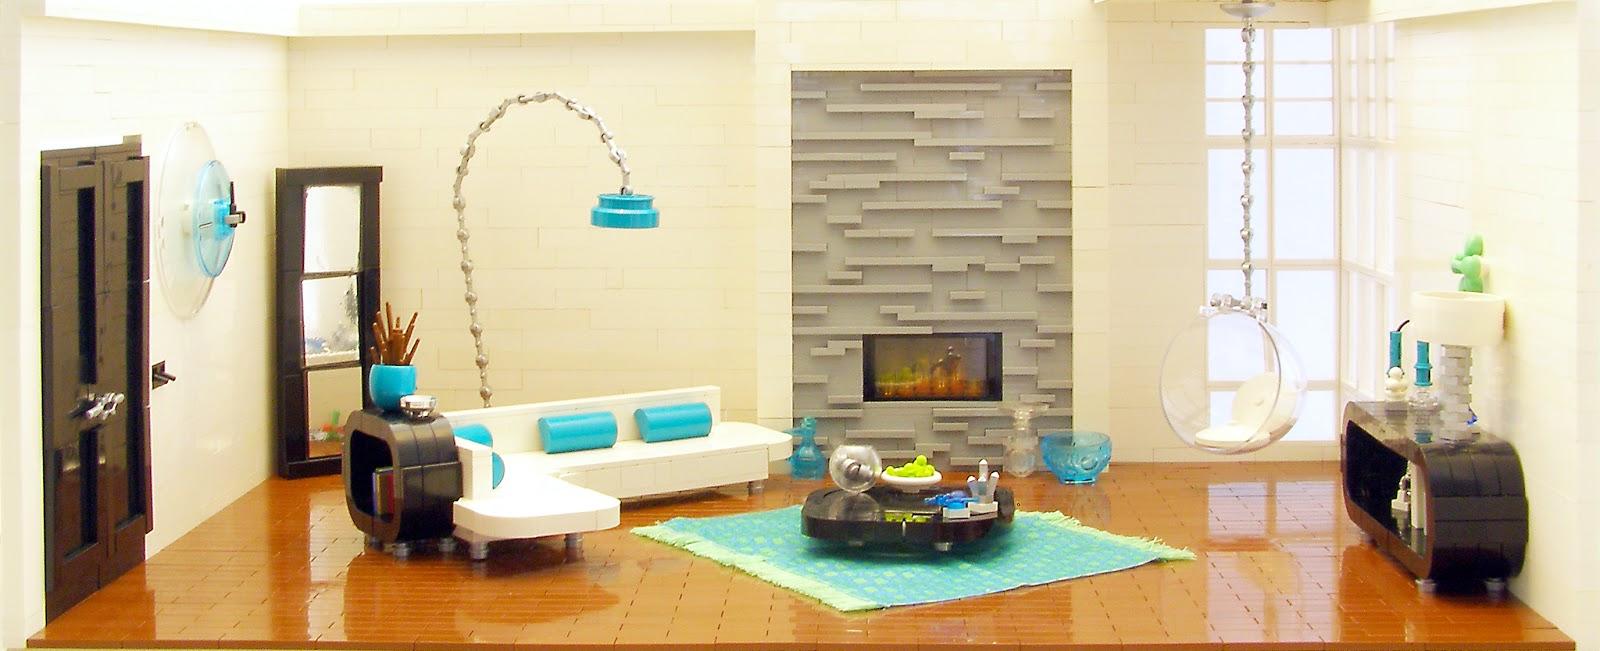 The Brickverse: Amazing Lego interiors